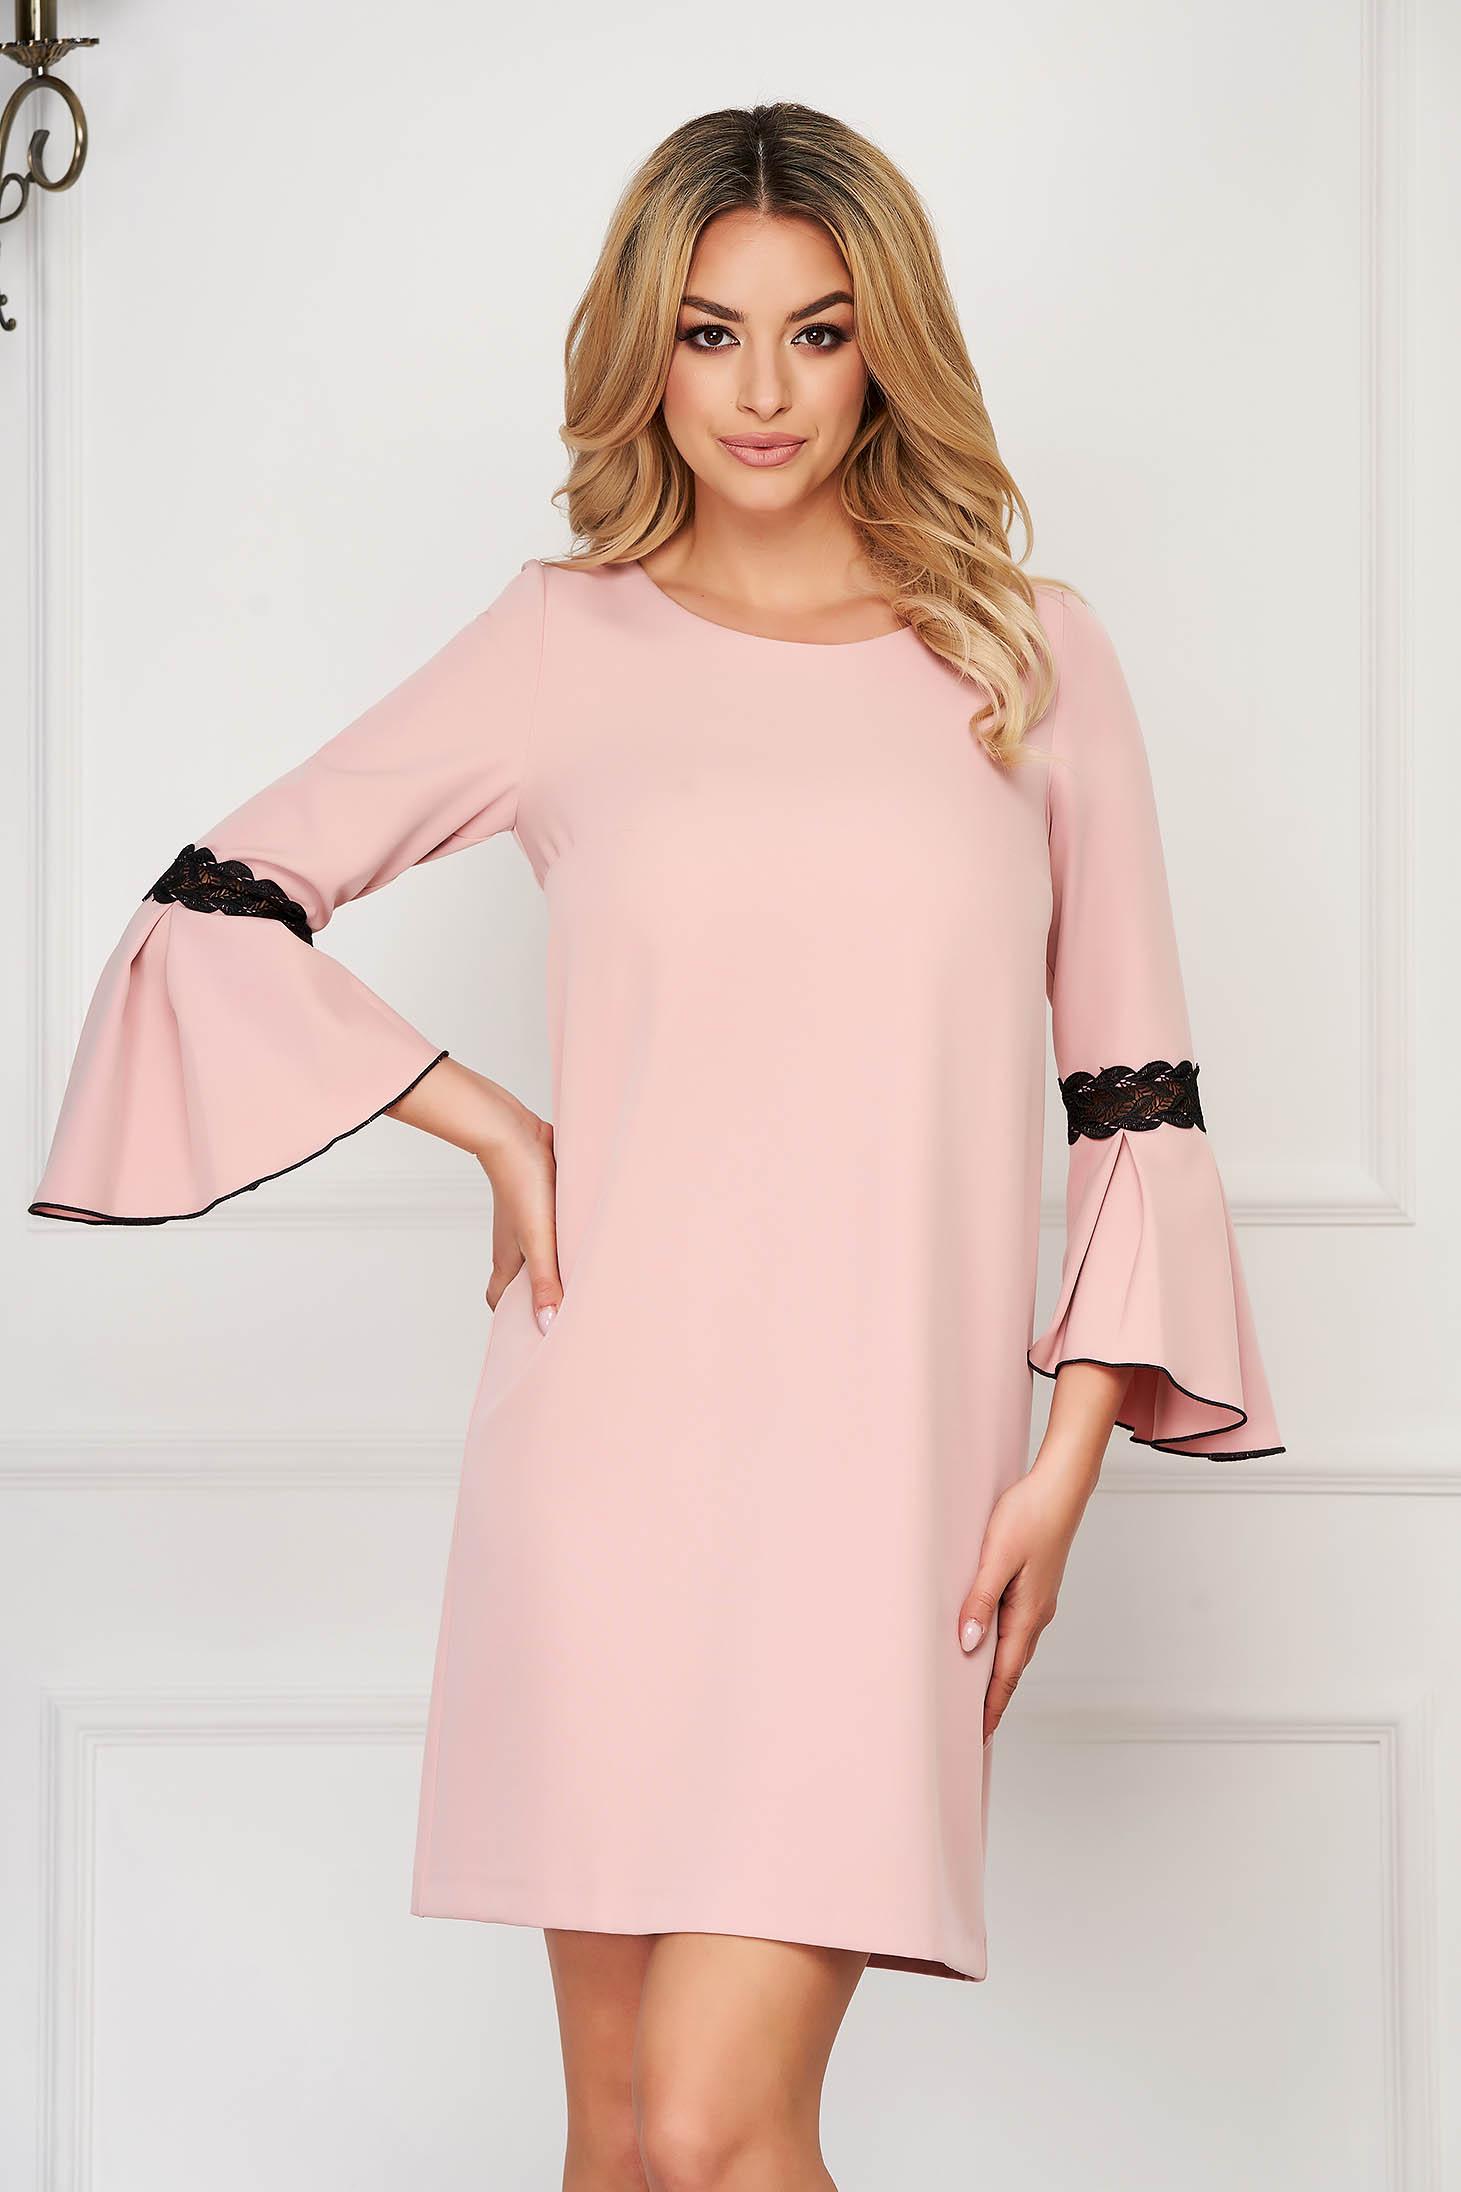 Rochie StarShinerS roz deschis scurta eleganta din stofa cu decolteu la baza gatului cu maneci trei-sferturi tip clopot si insertii de broderie